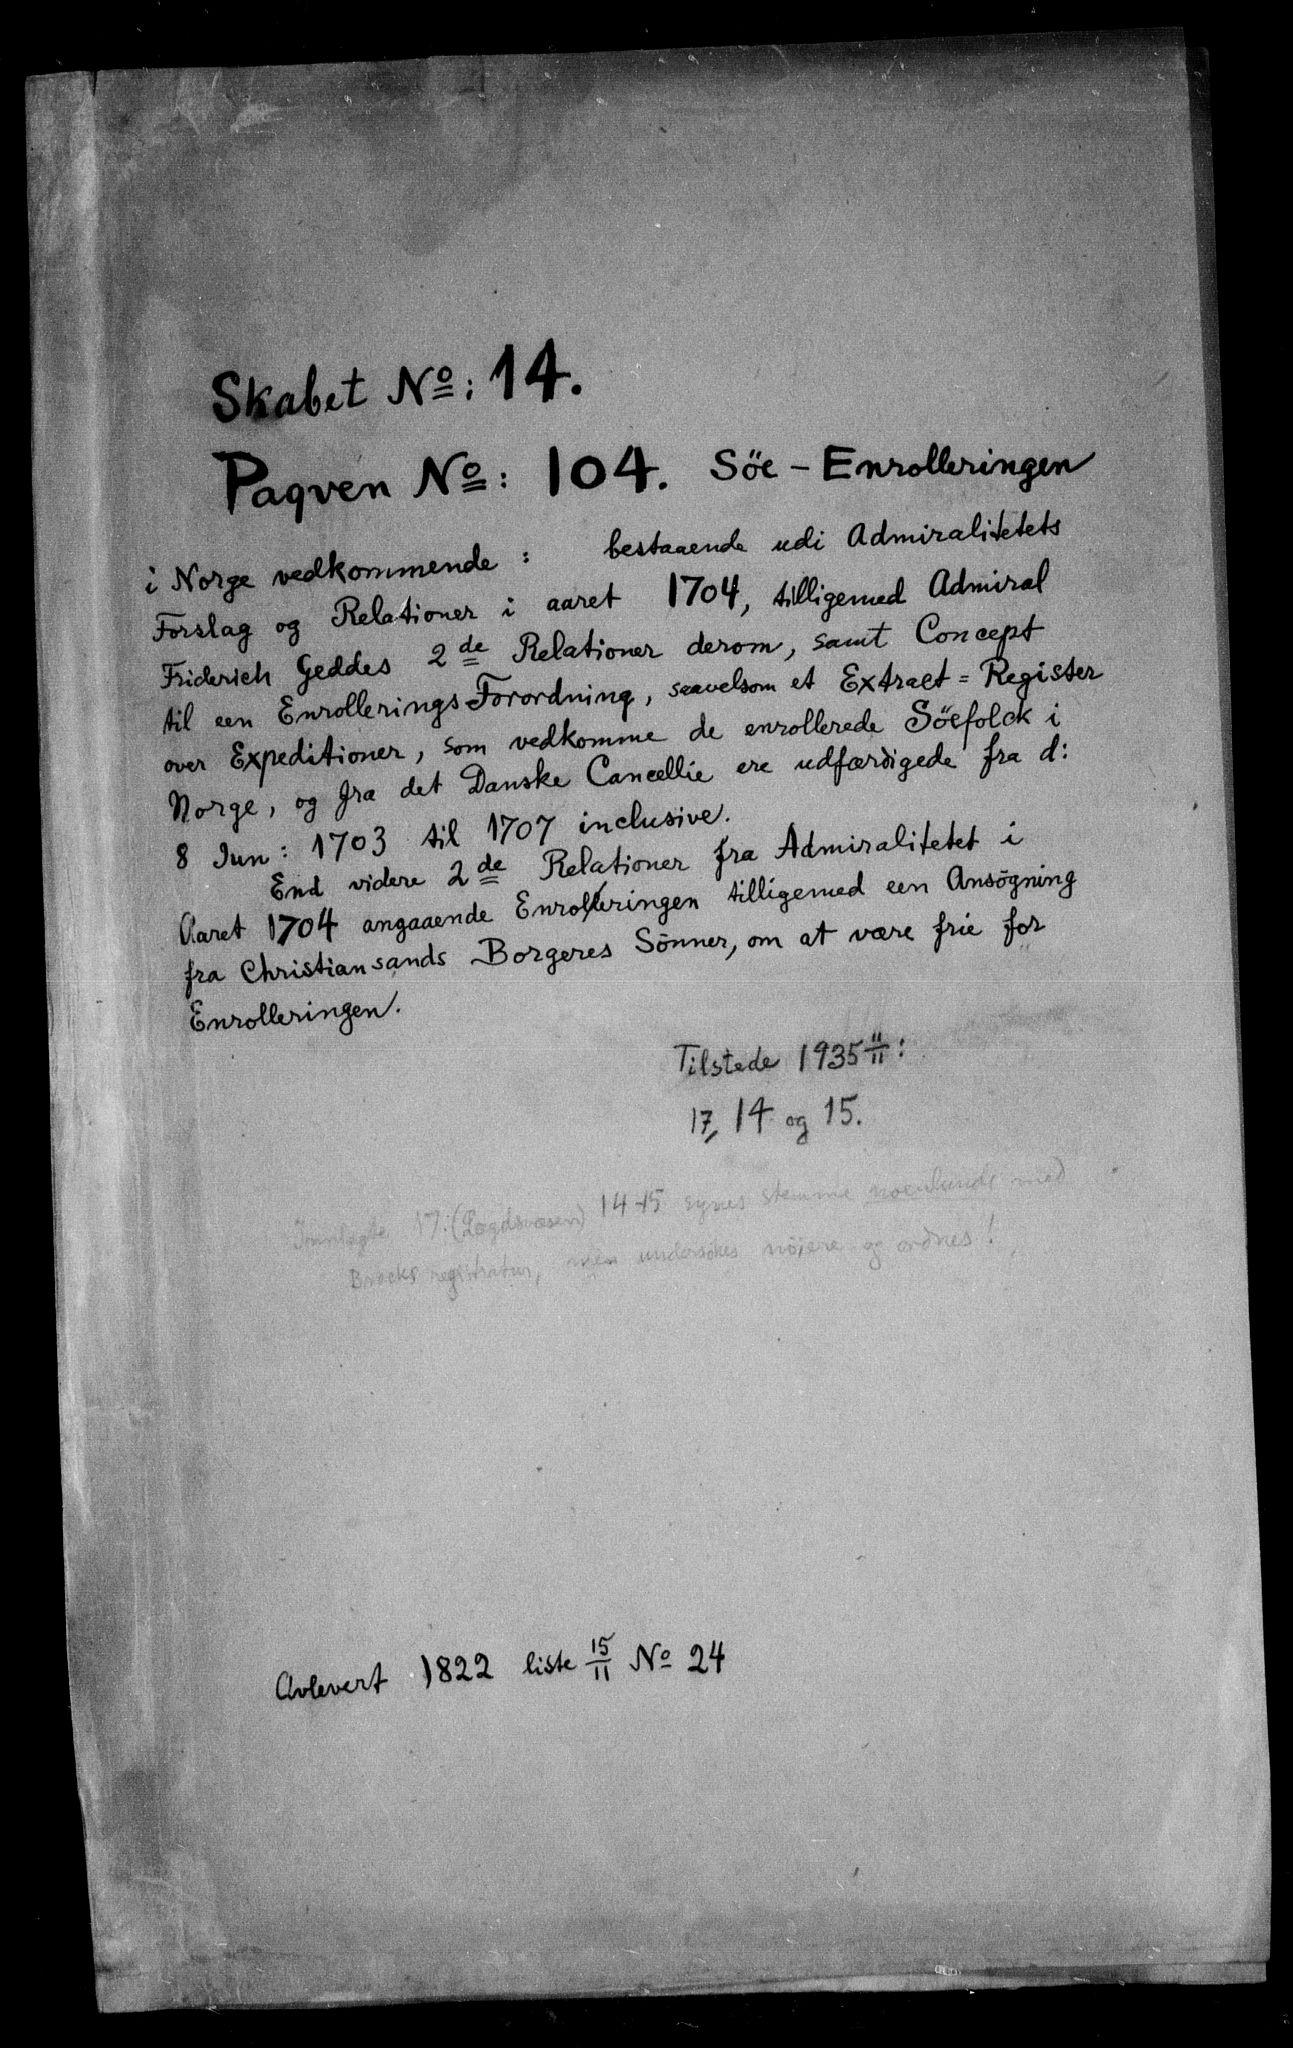 RA, Danske Kanselli, Skapsaker, F/L0058: Skap 14, pakke 104-111A, 1604-1720, s. 3